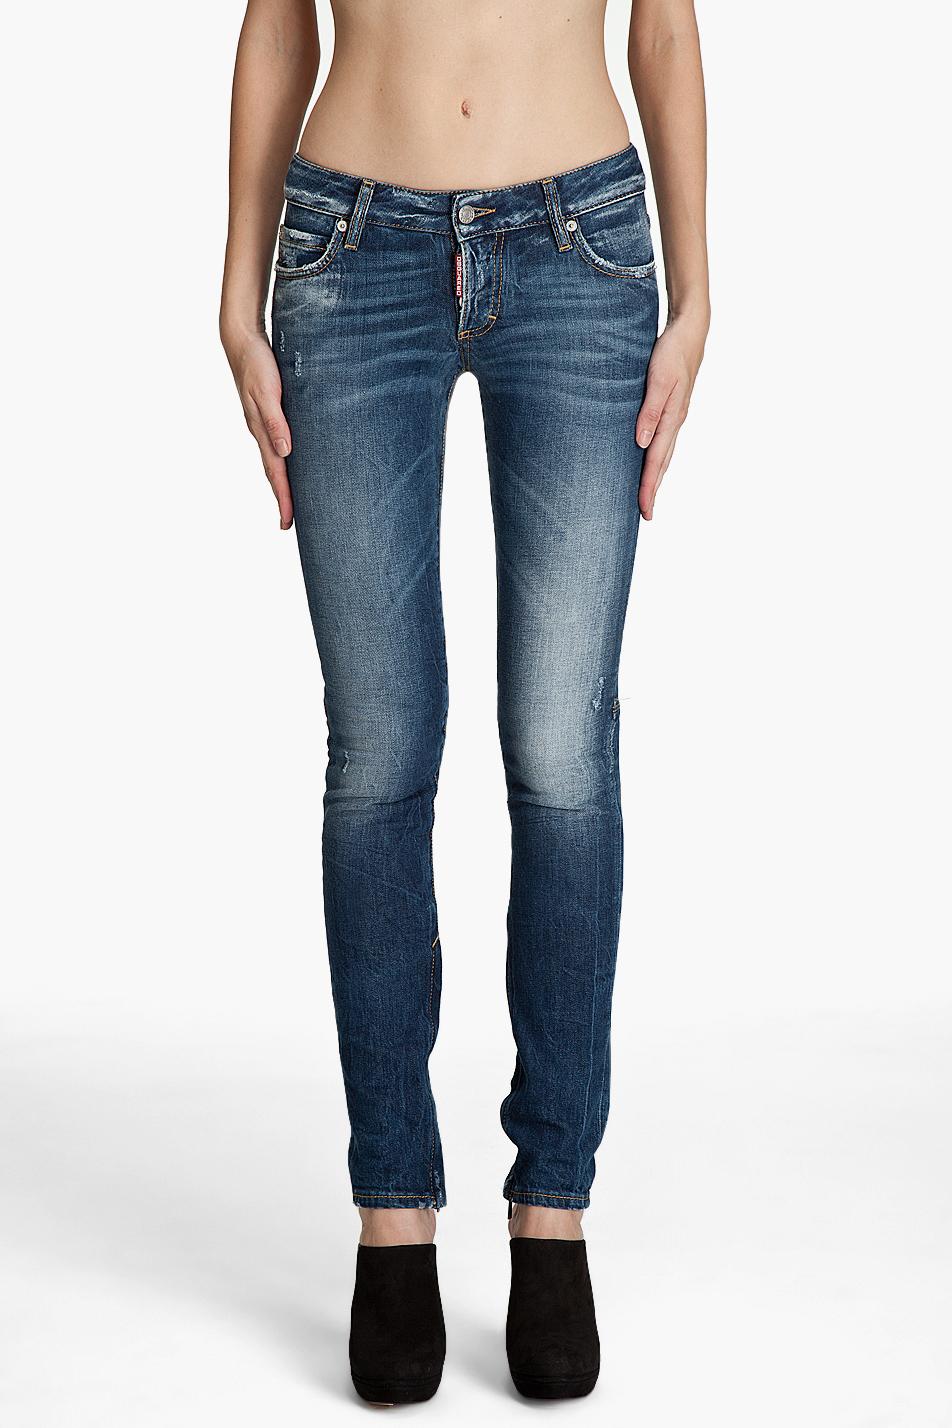 lyst dsquared super skinny low rise jeans in blue. Black Bedroom Furniture Sets. Home Design Ideas